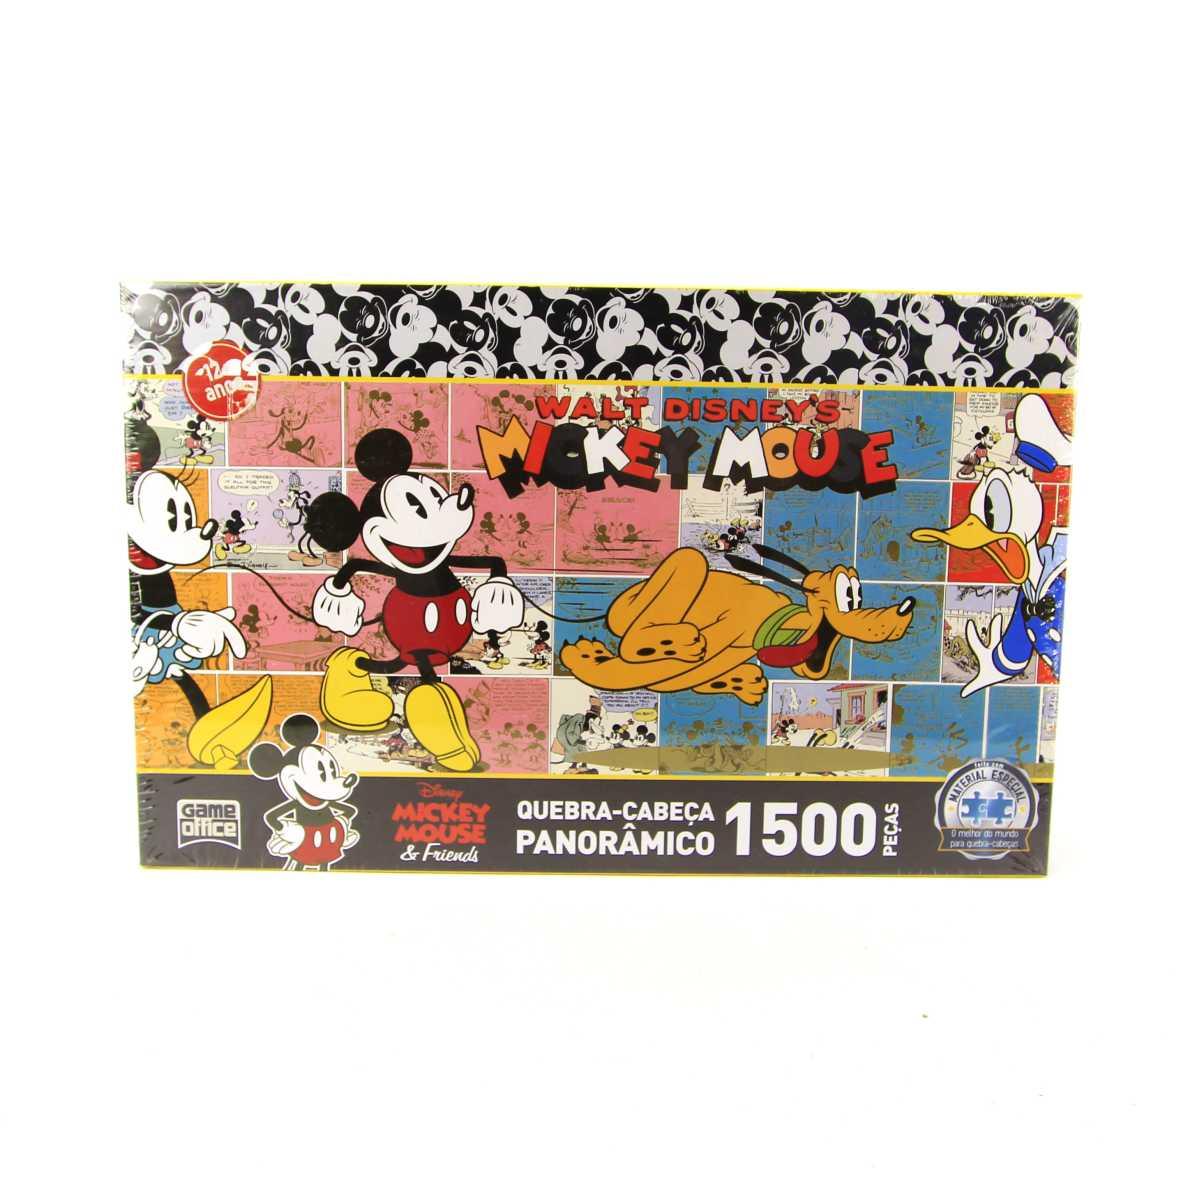 Quebra Cabeça Panorâmico Mickey Mouse e Friends 1500 peças Game Office 2715